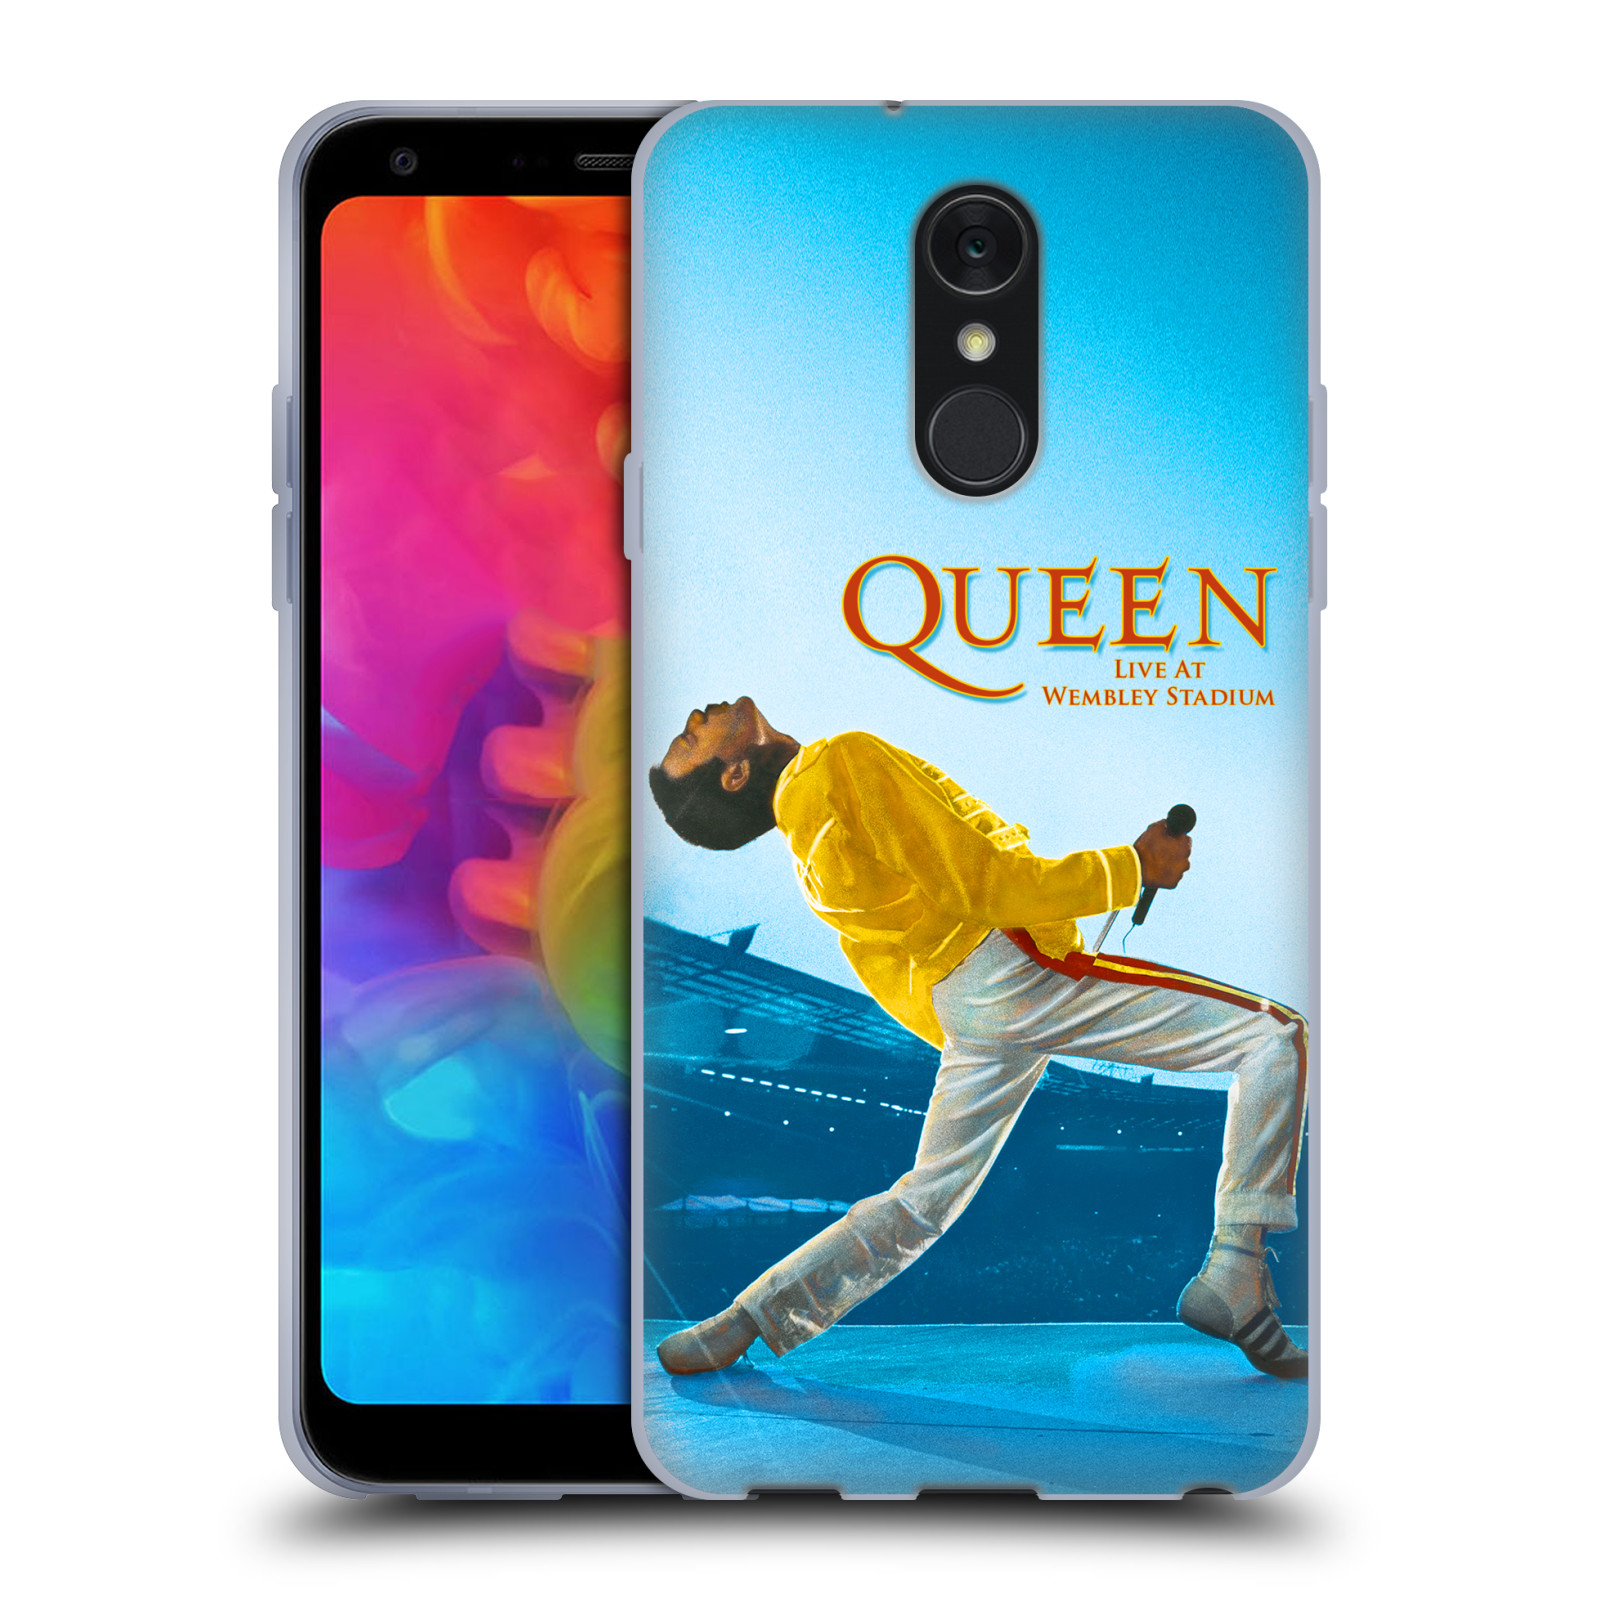 Silikonové pouzdro na mobil LG Q7 - Head Case - Queen - Freddie Mercury